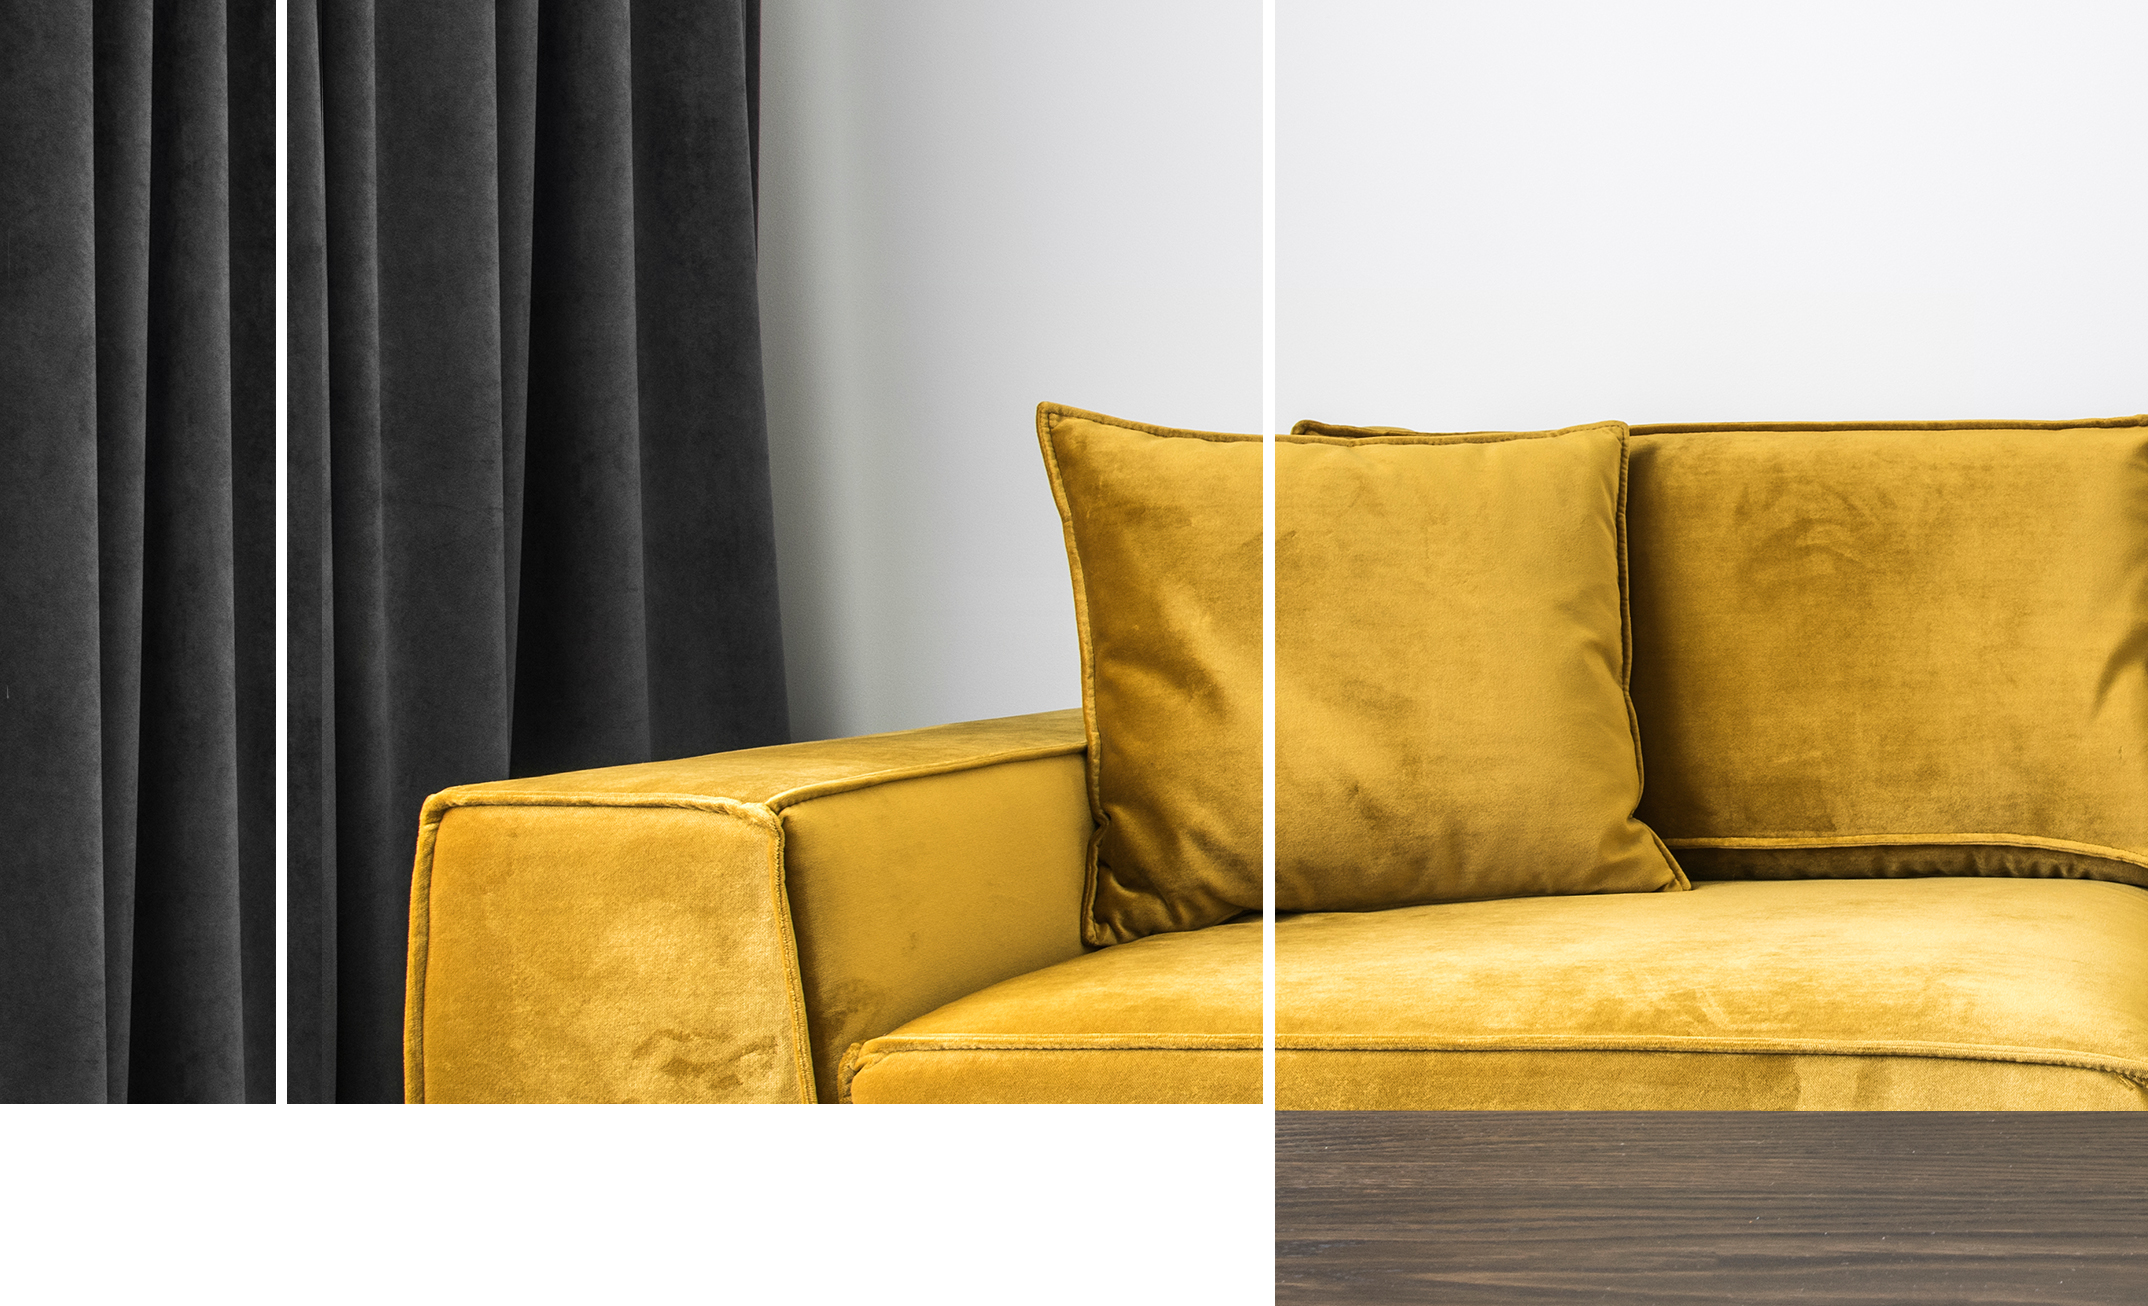 EJtekstile–-interjero-tekstiles-projektavimo-studija--Interior-textile-design-studio-5.2